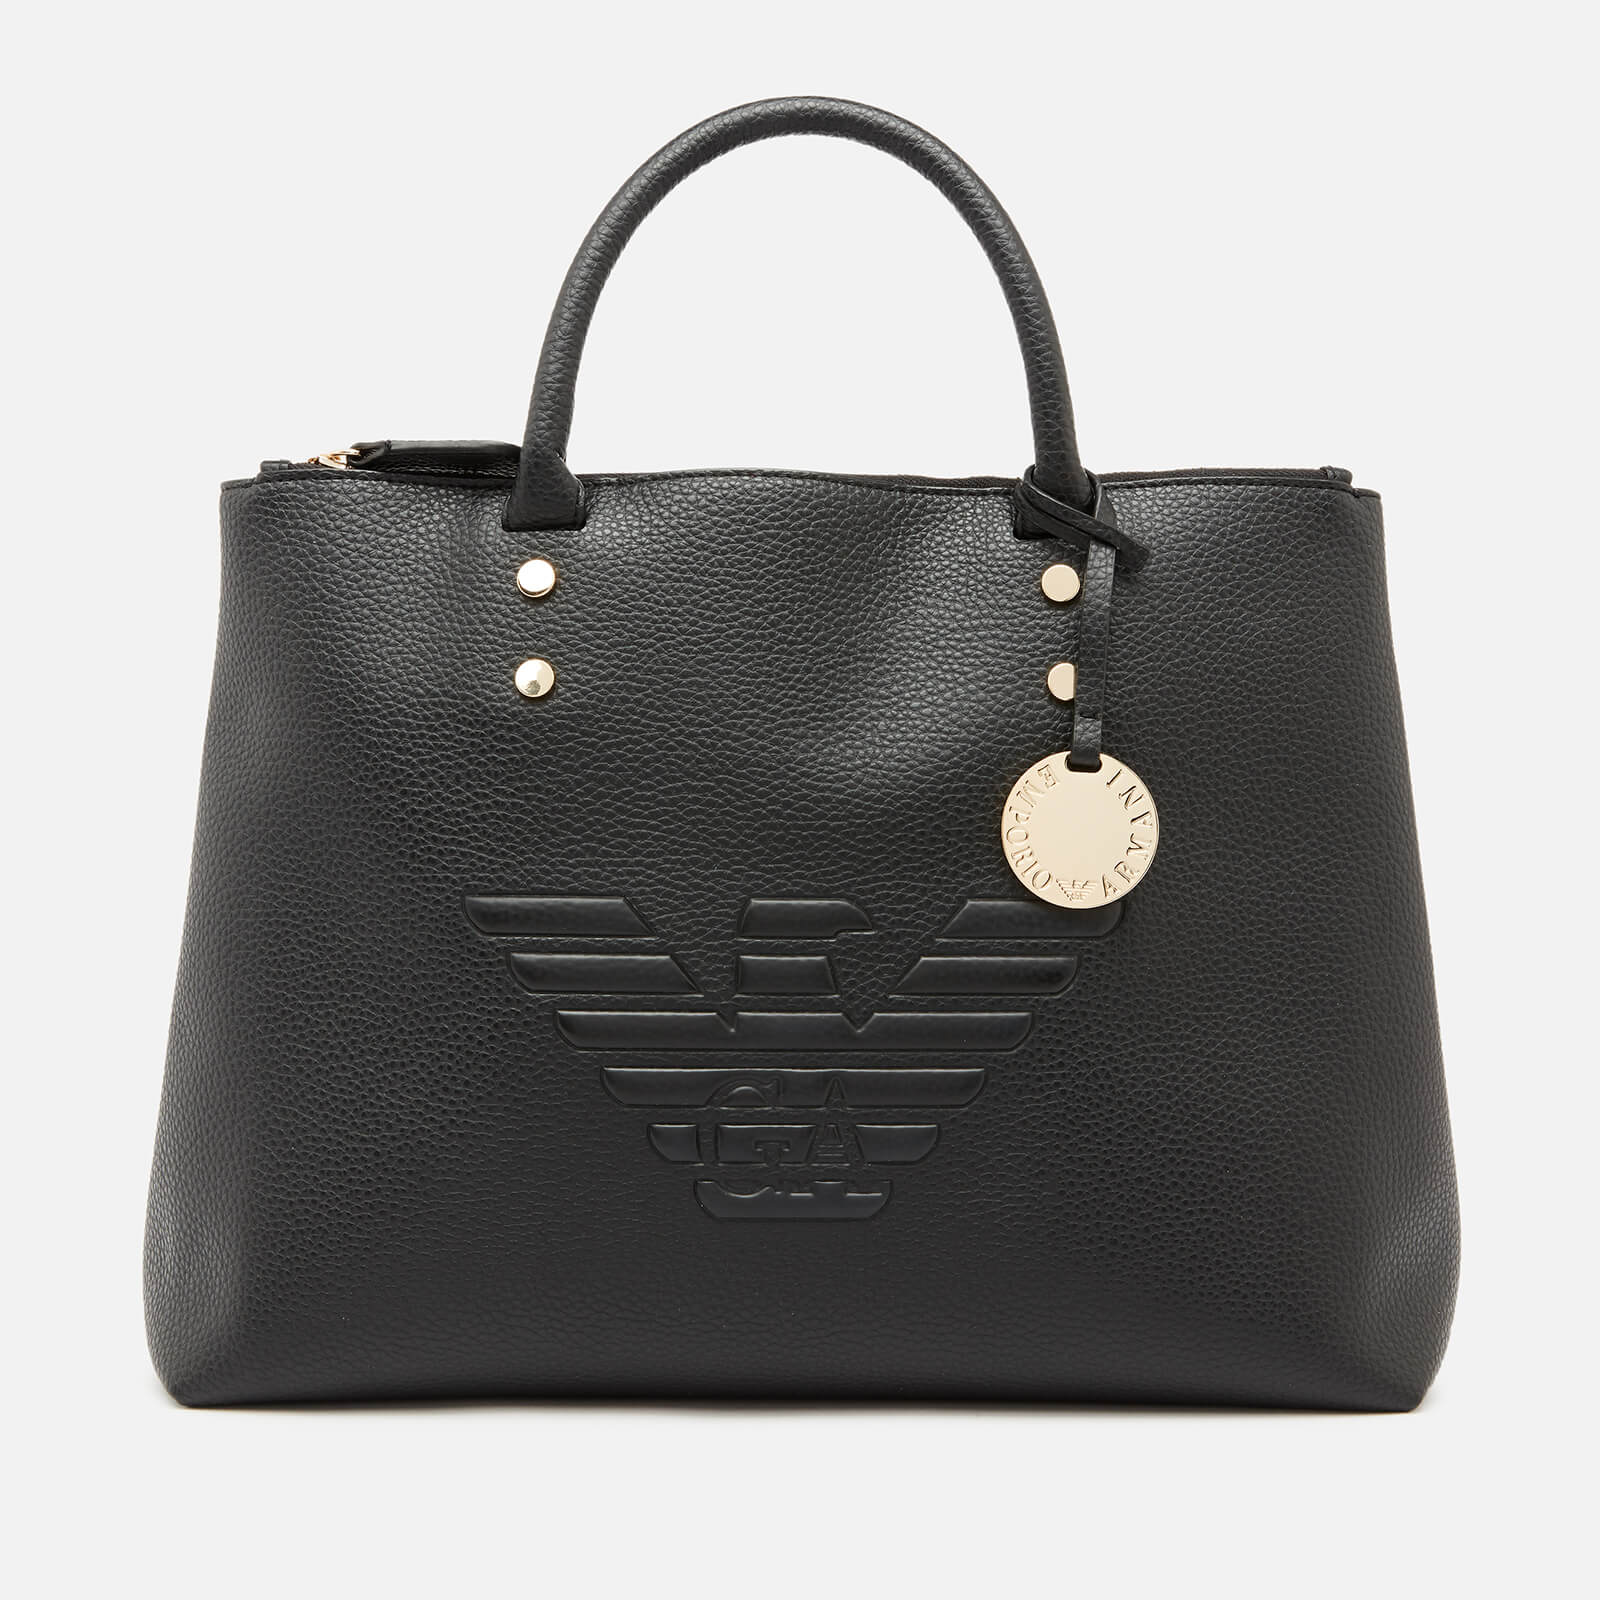 9056564350 Emporio Armani Women's Eagle Cross Body Bag - Black